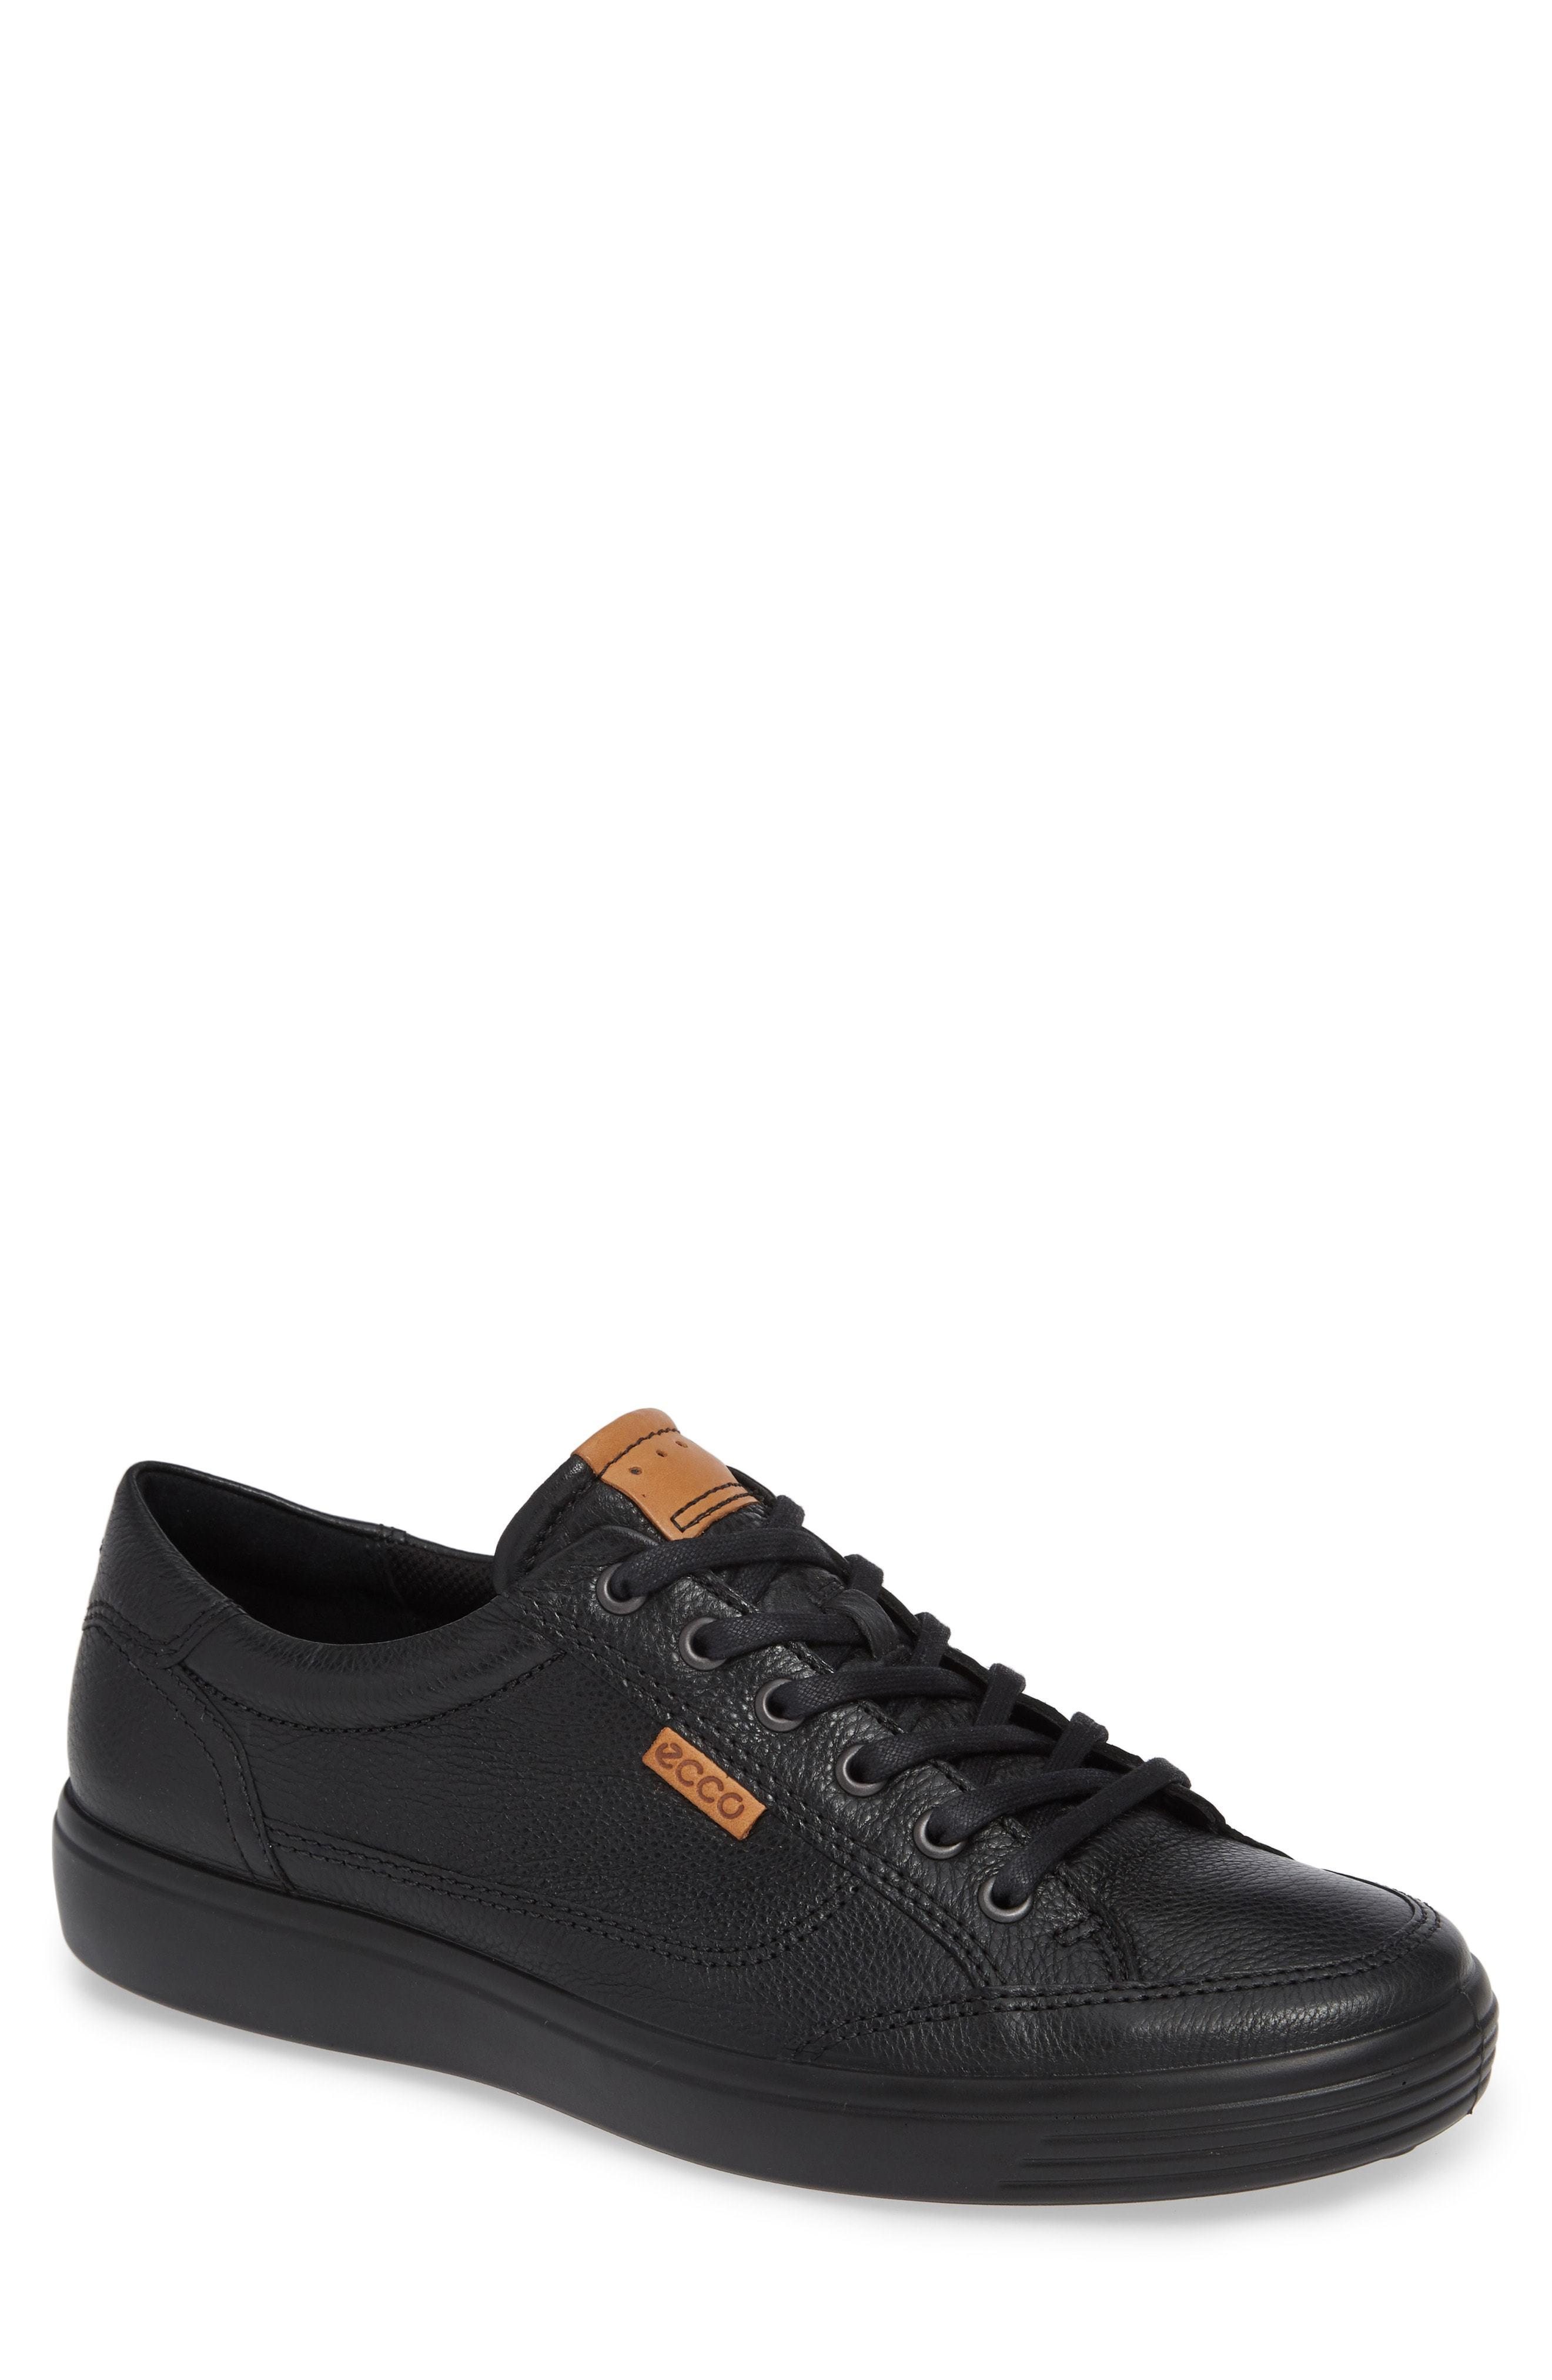 7f5c5cf806090 ... Black Leather Low Top Sneakers Ecco Soft 7 Sneaker